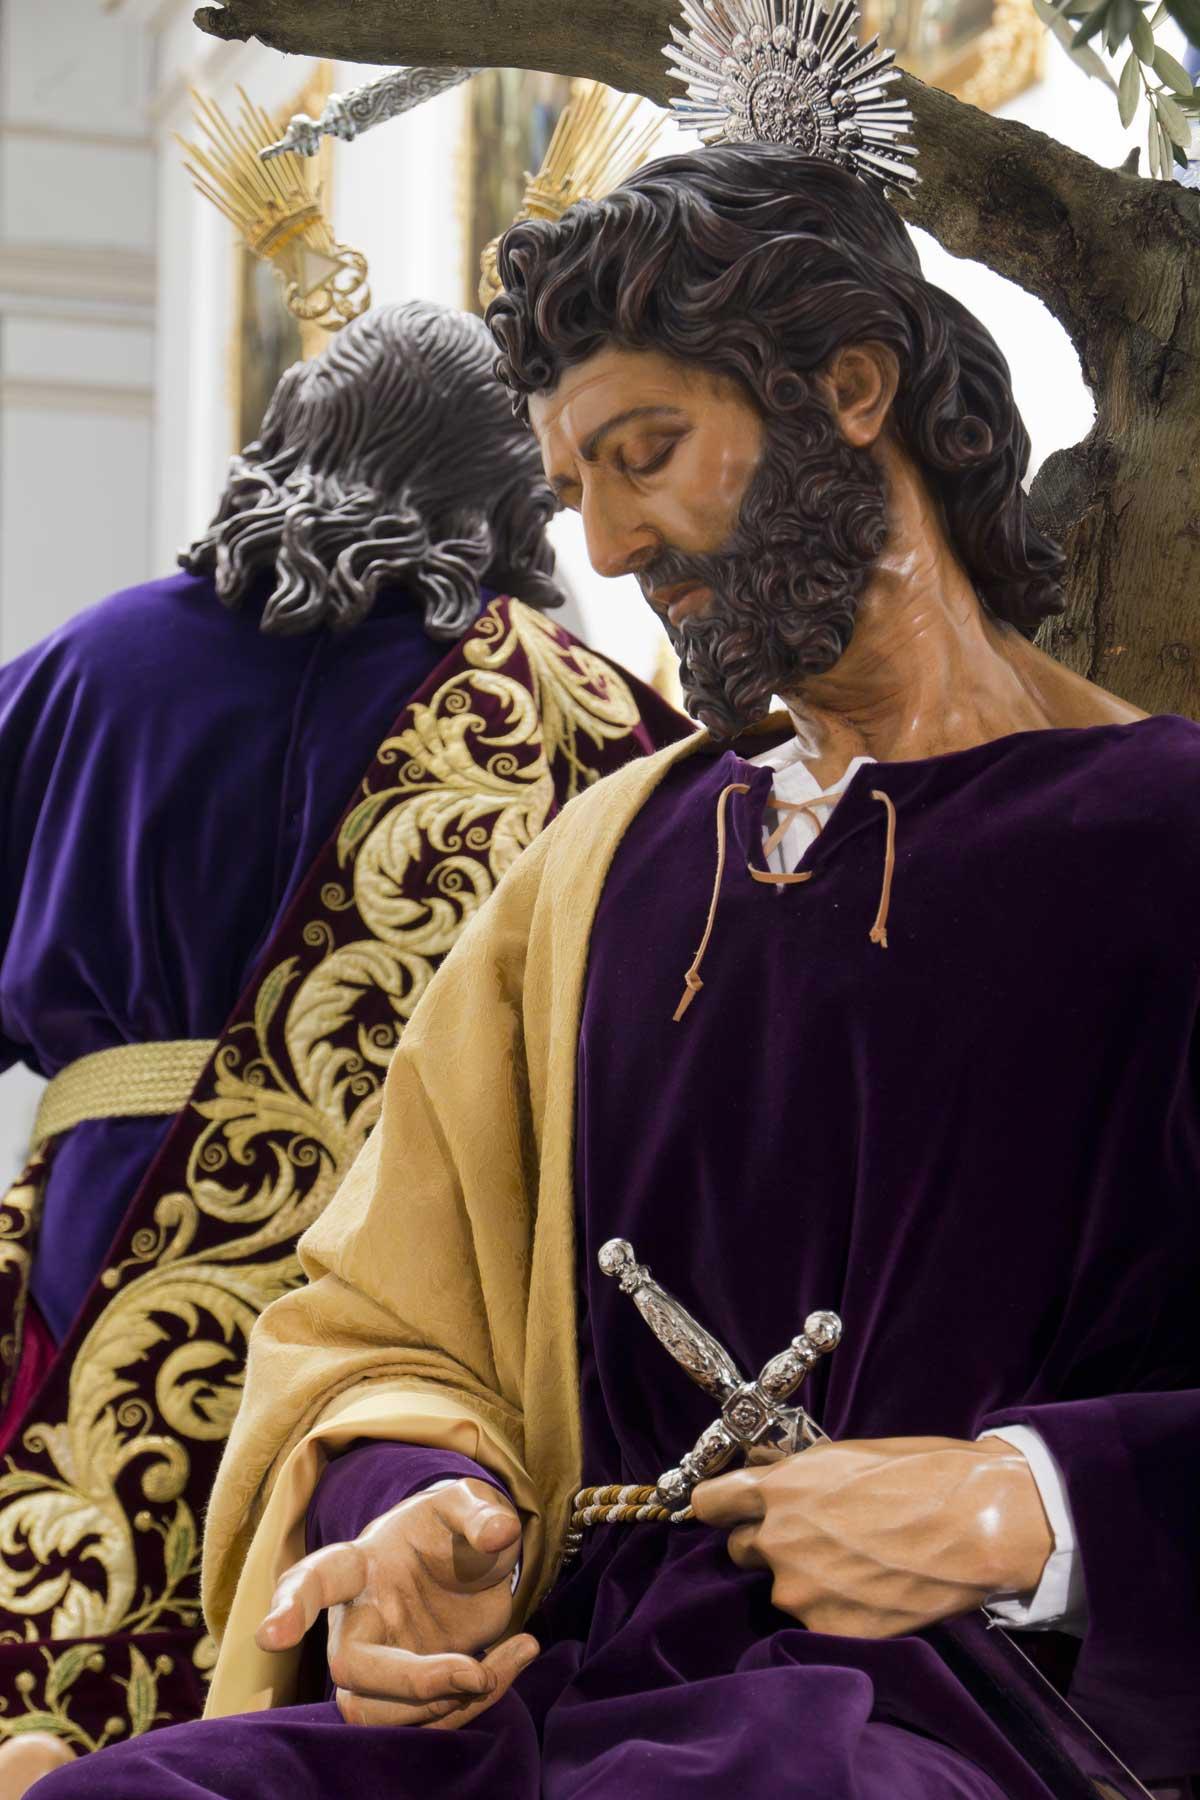 misterio-de-jesus-de-la-agonia-orando-en-el-huerto-de-lucena-cordoba-10